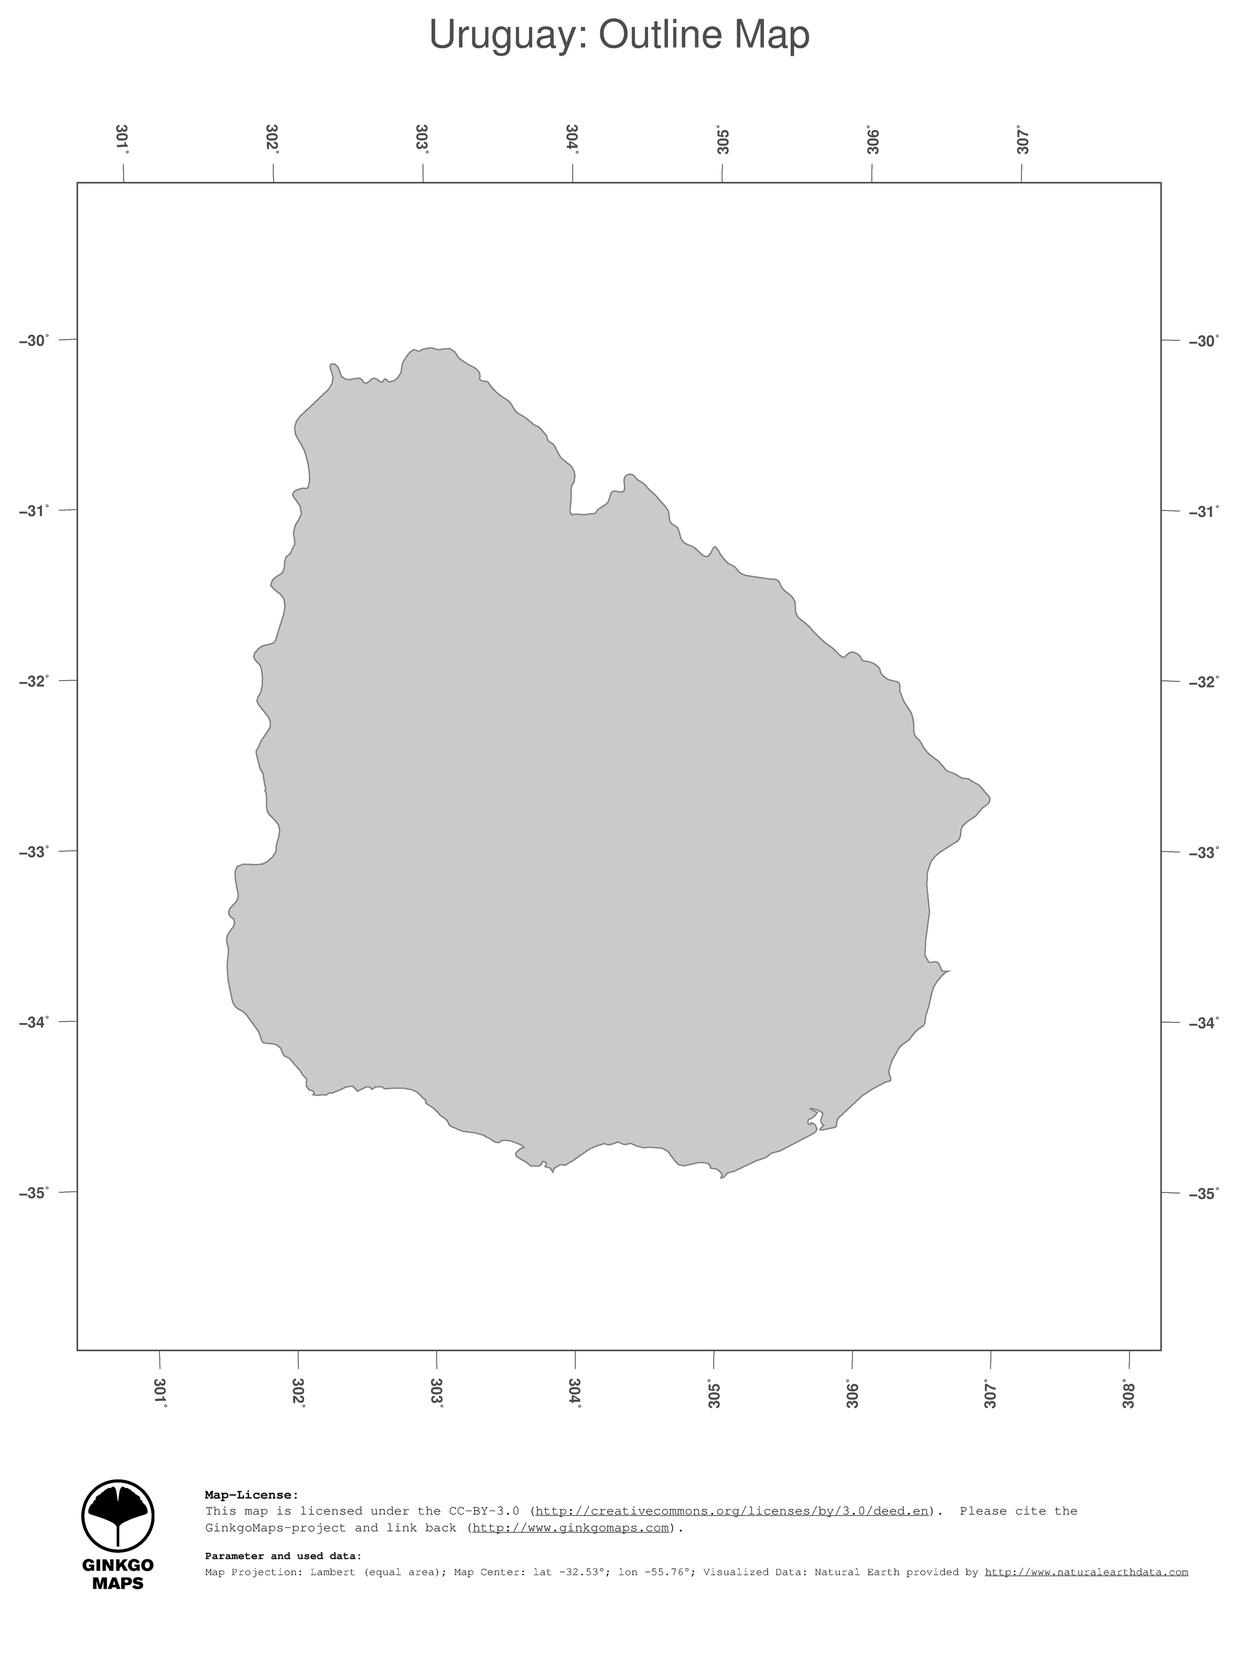 Map Uruguay GinkgoMaps Continent South America Region Uruguay - Uruguay blank map